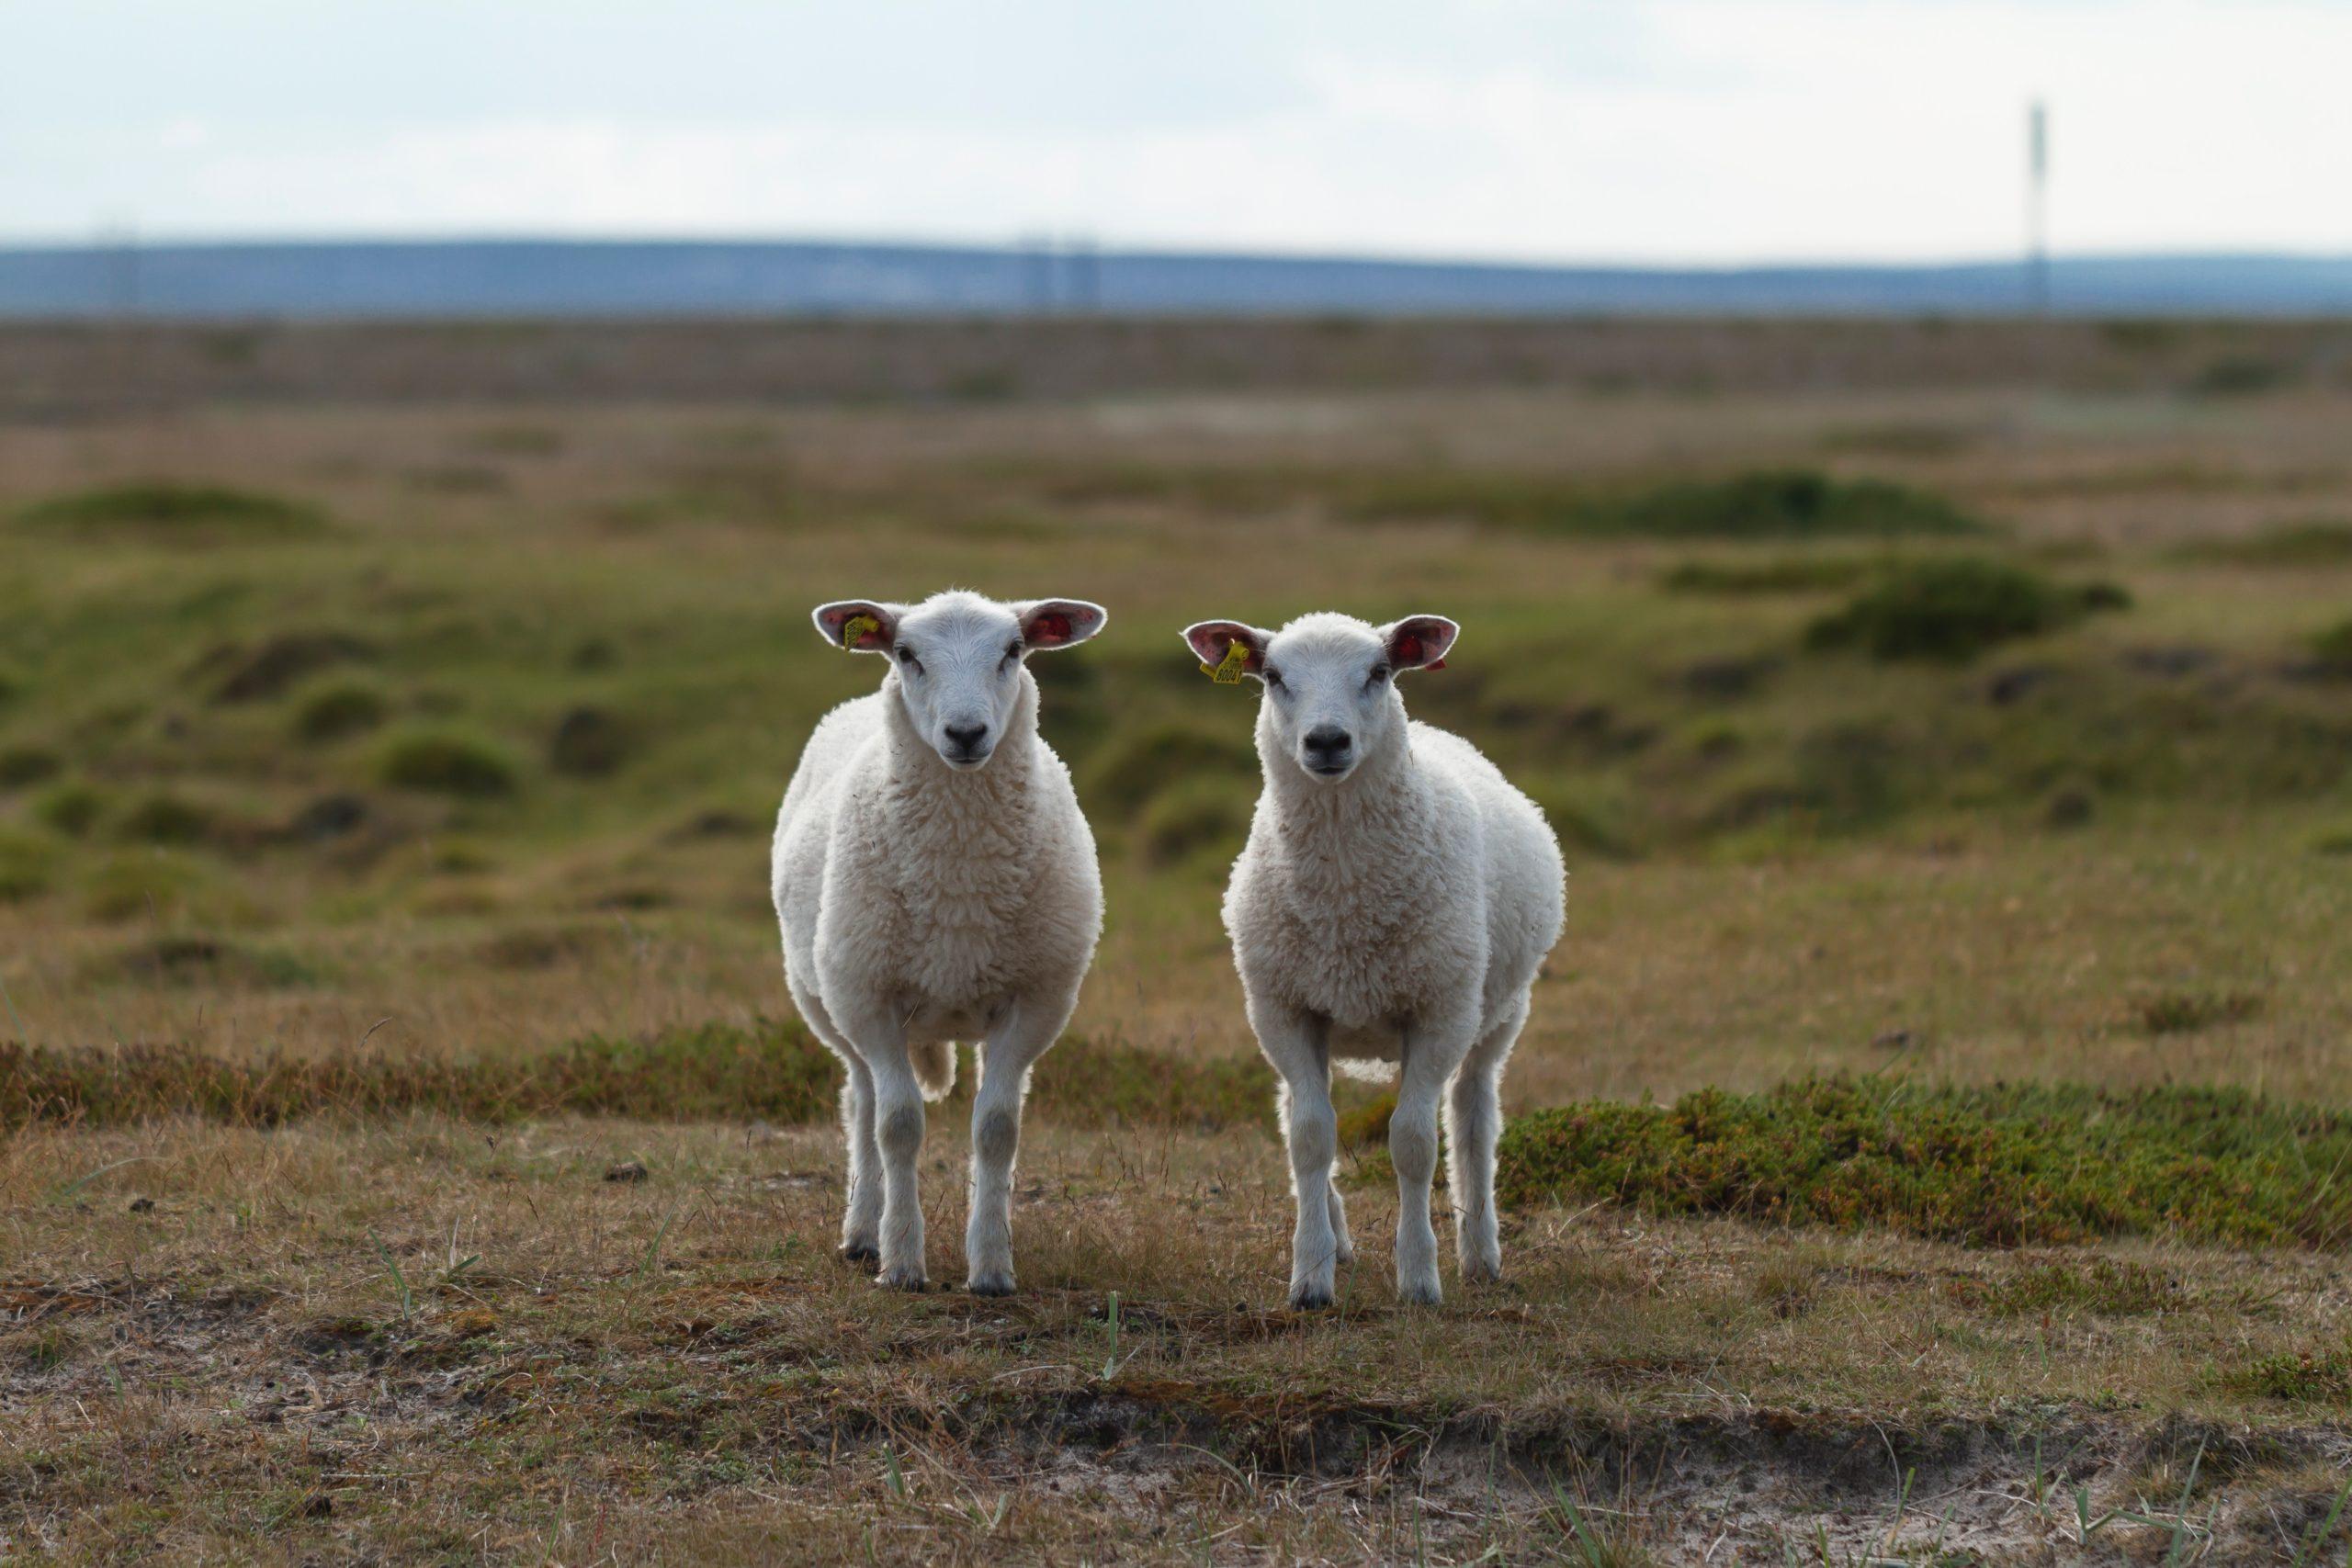 Cultural Christianity vs. Biblical Christianity, sheep vs. goats, 2 Corinthians 13:5